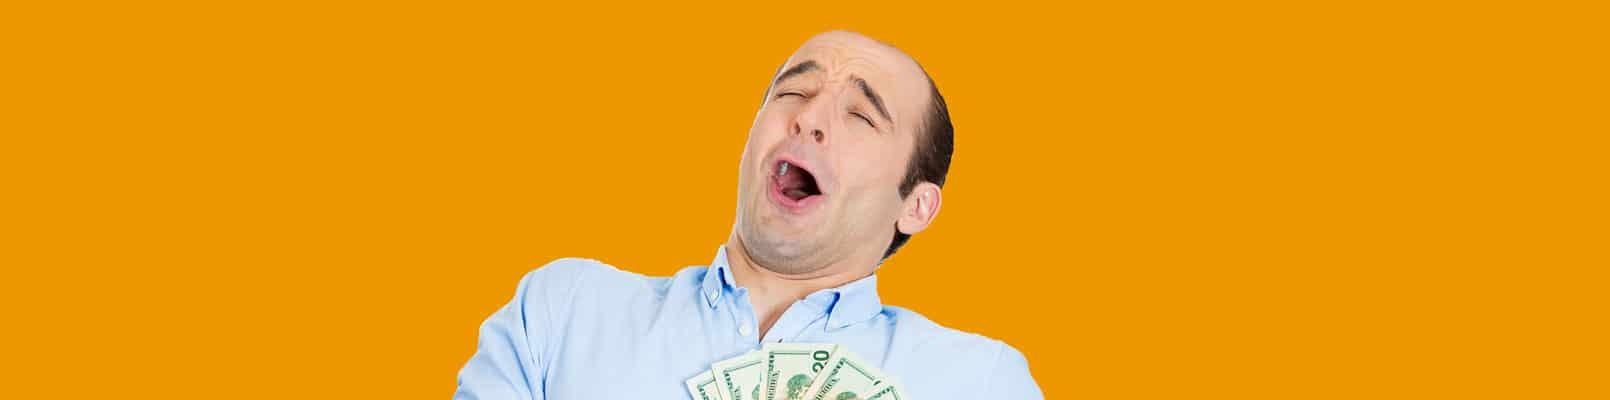 faceți bani ușor schimbarea limbii)